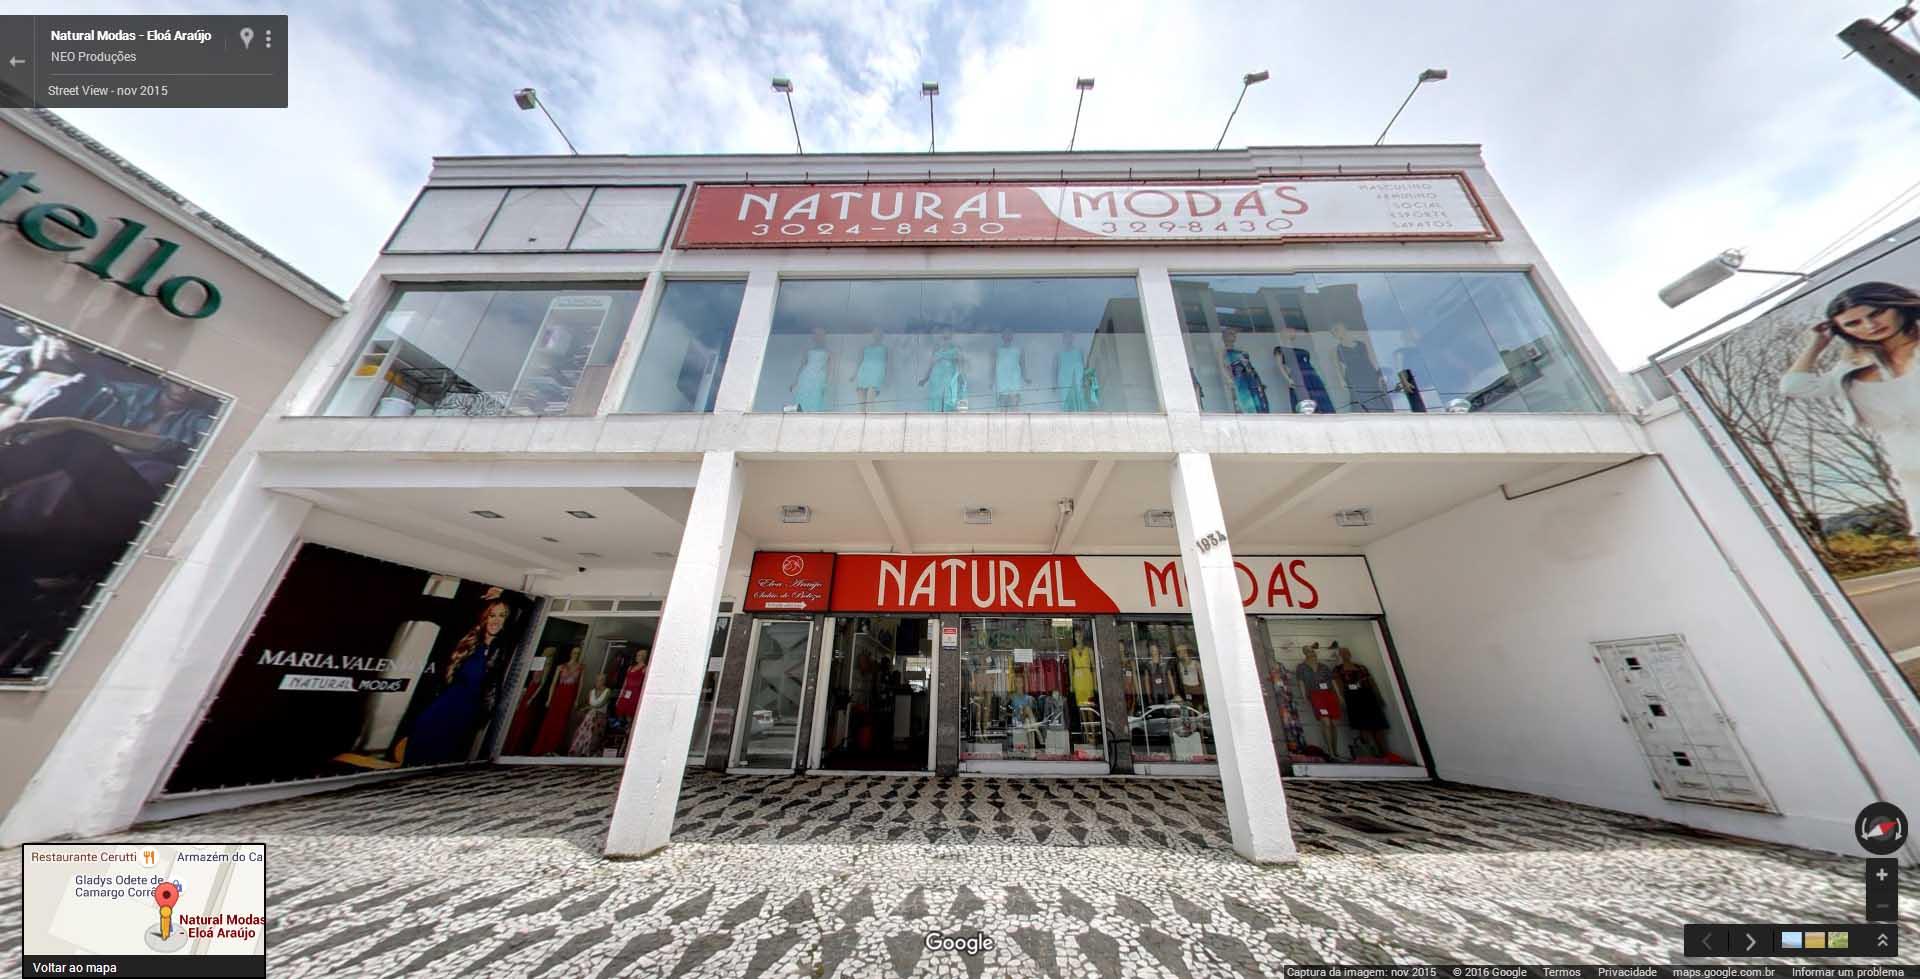 Natural Modas - Eloá Araújo